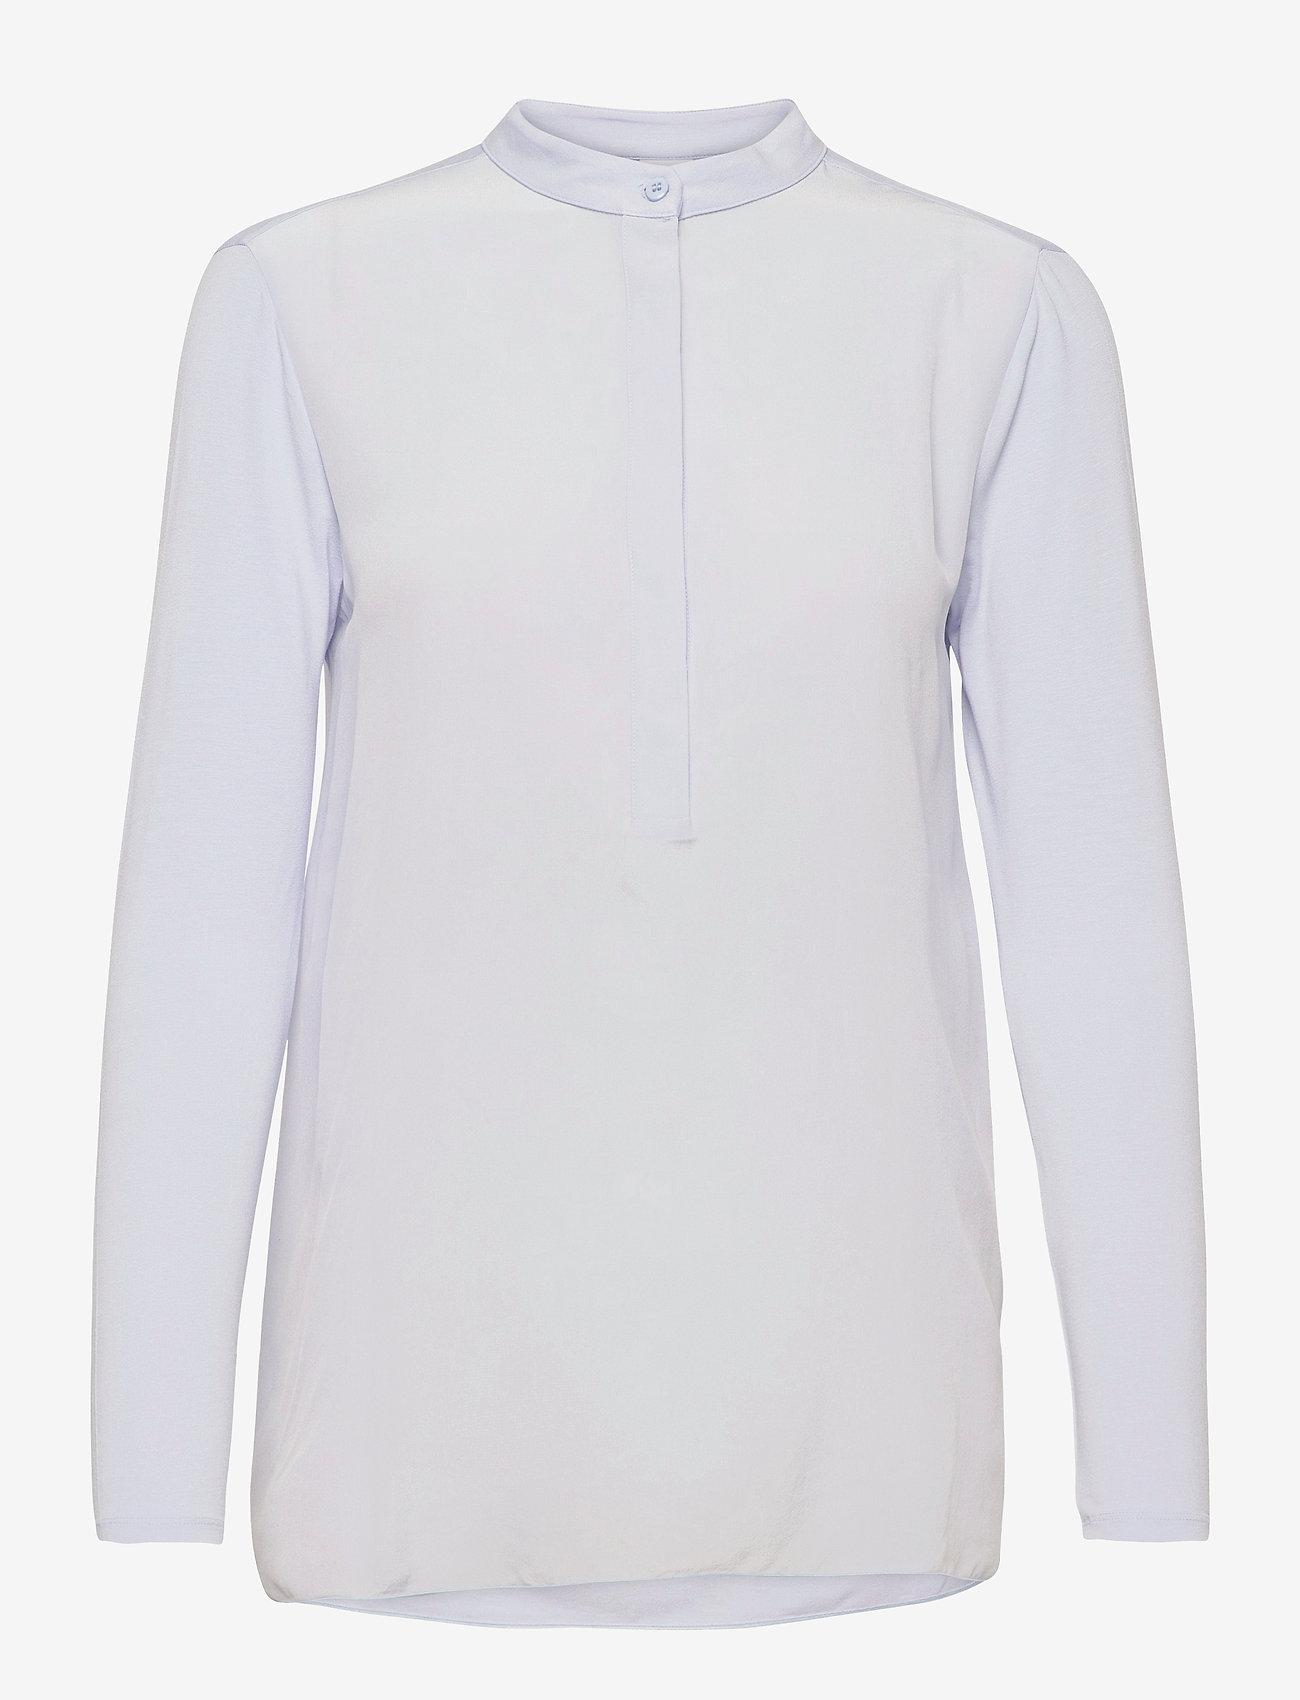 Max Mara Leisure - HAITI - long sleeved blouses - light blue - 0